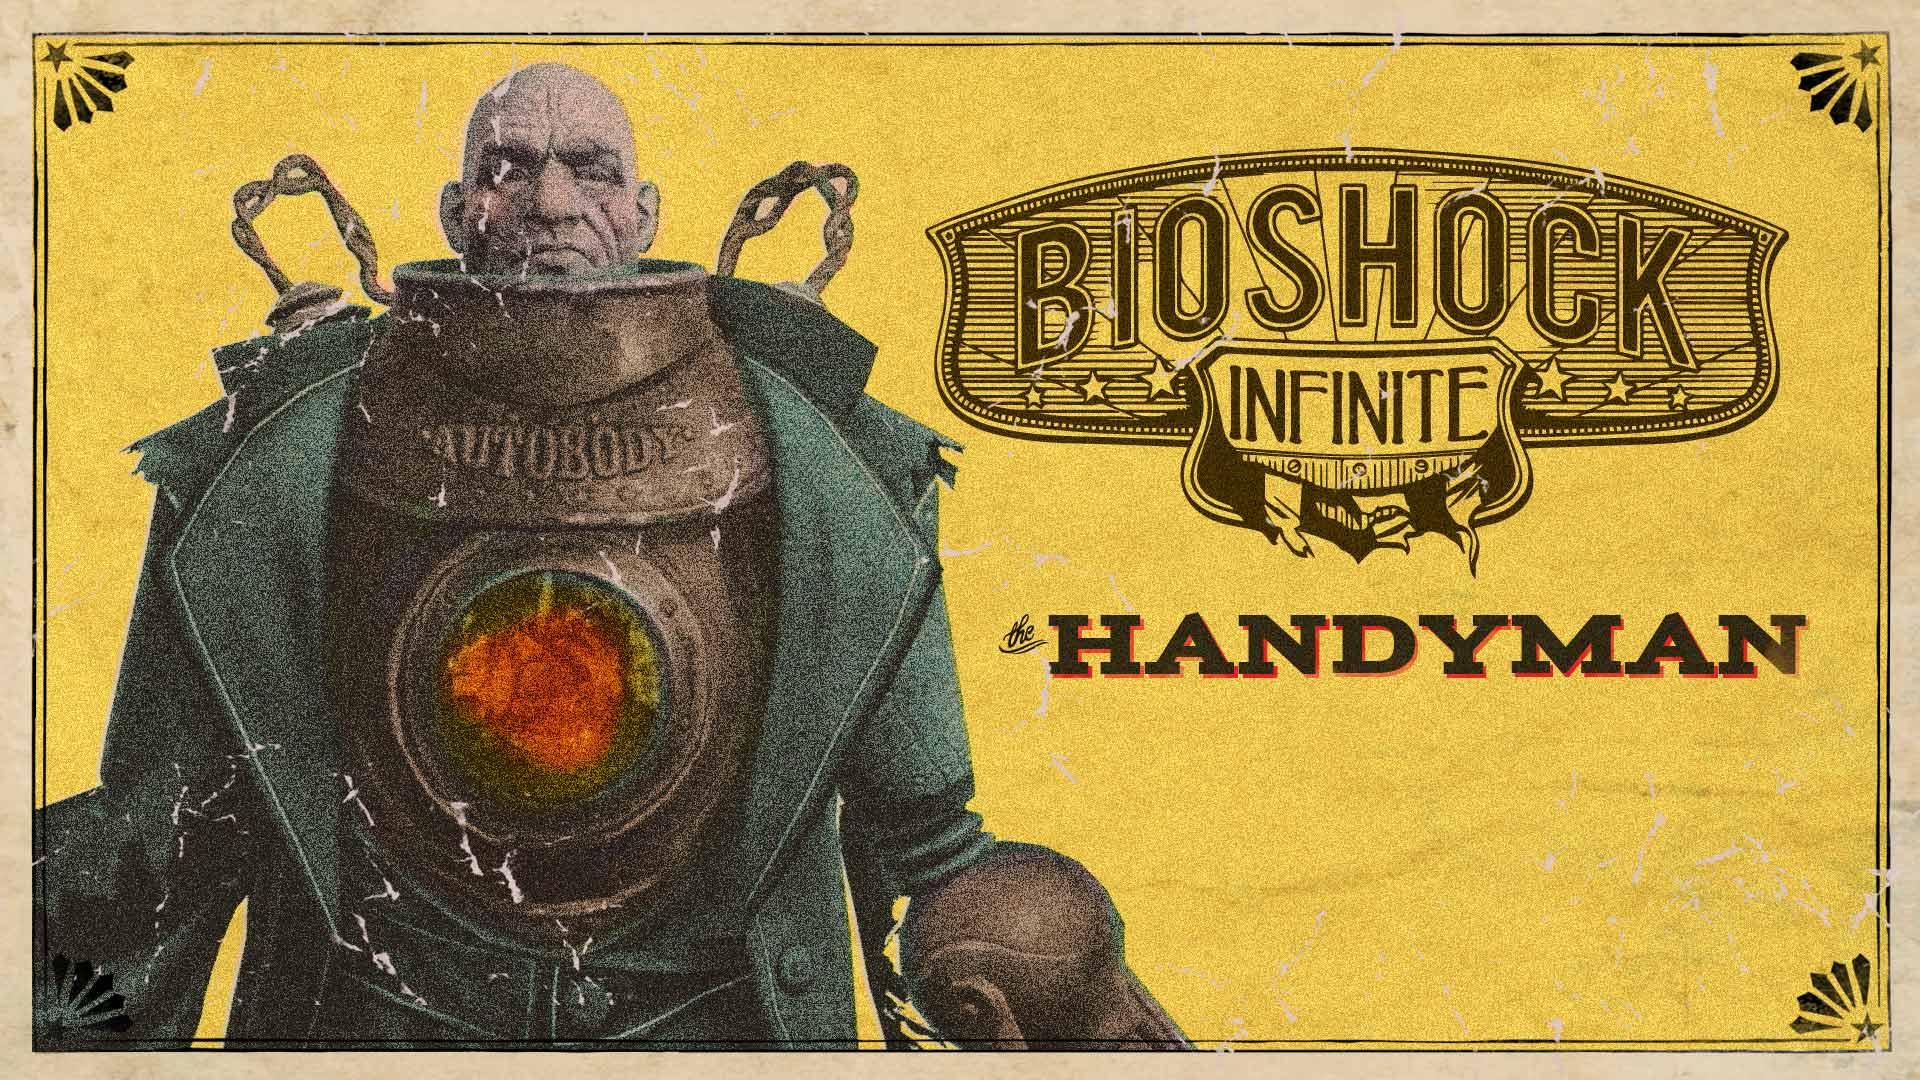 Bioshock infinite handyman steam trading cards wiki - Bioshock wikia ...